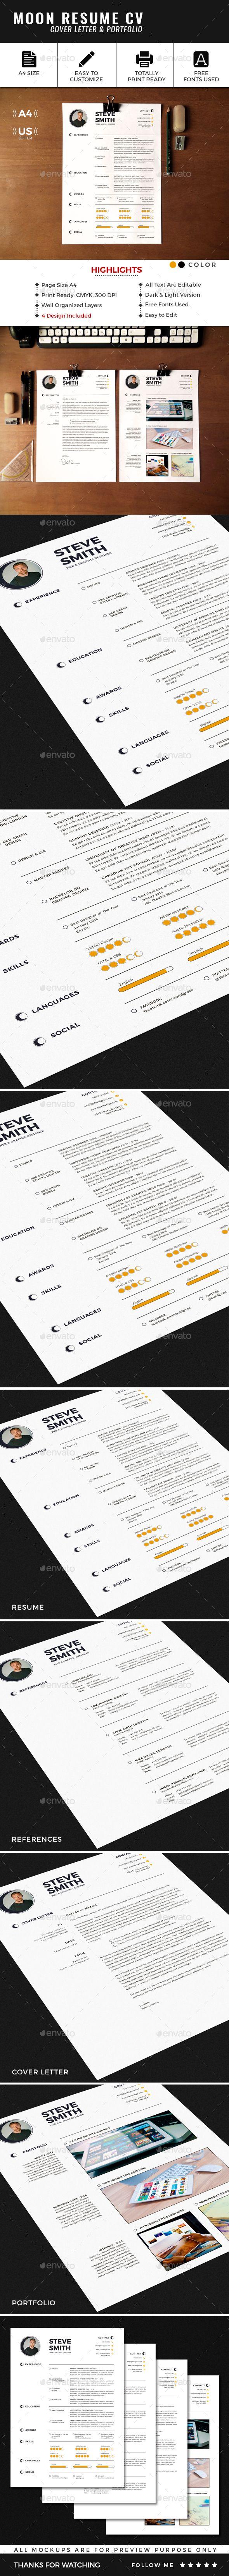 1458 best Резюме images on Pinterest | Cv template, Design resume ...